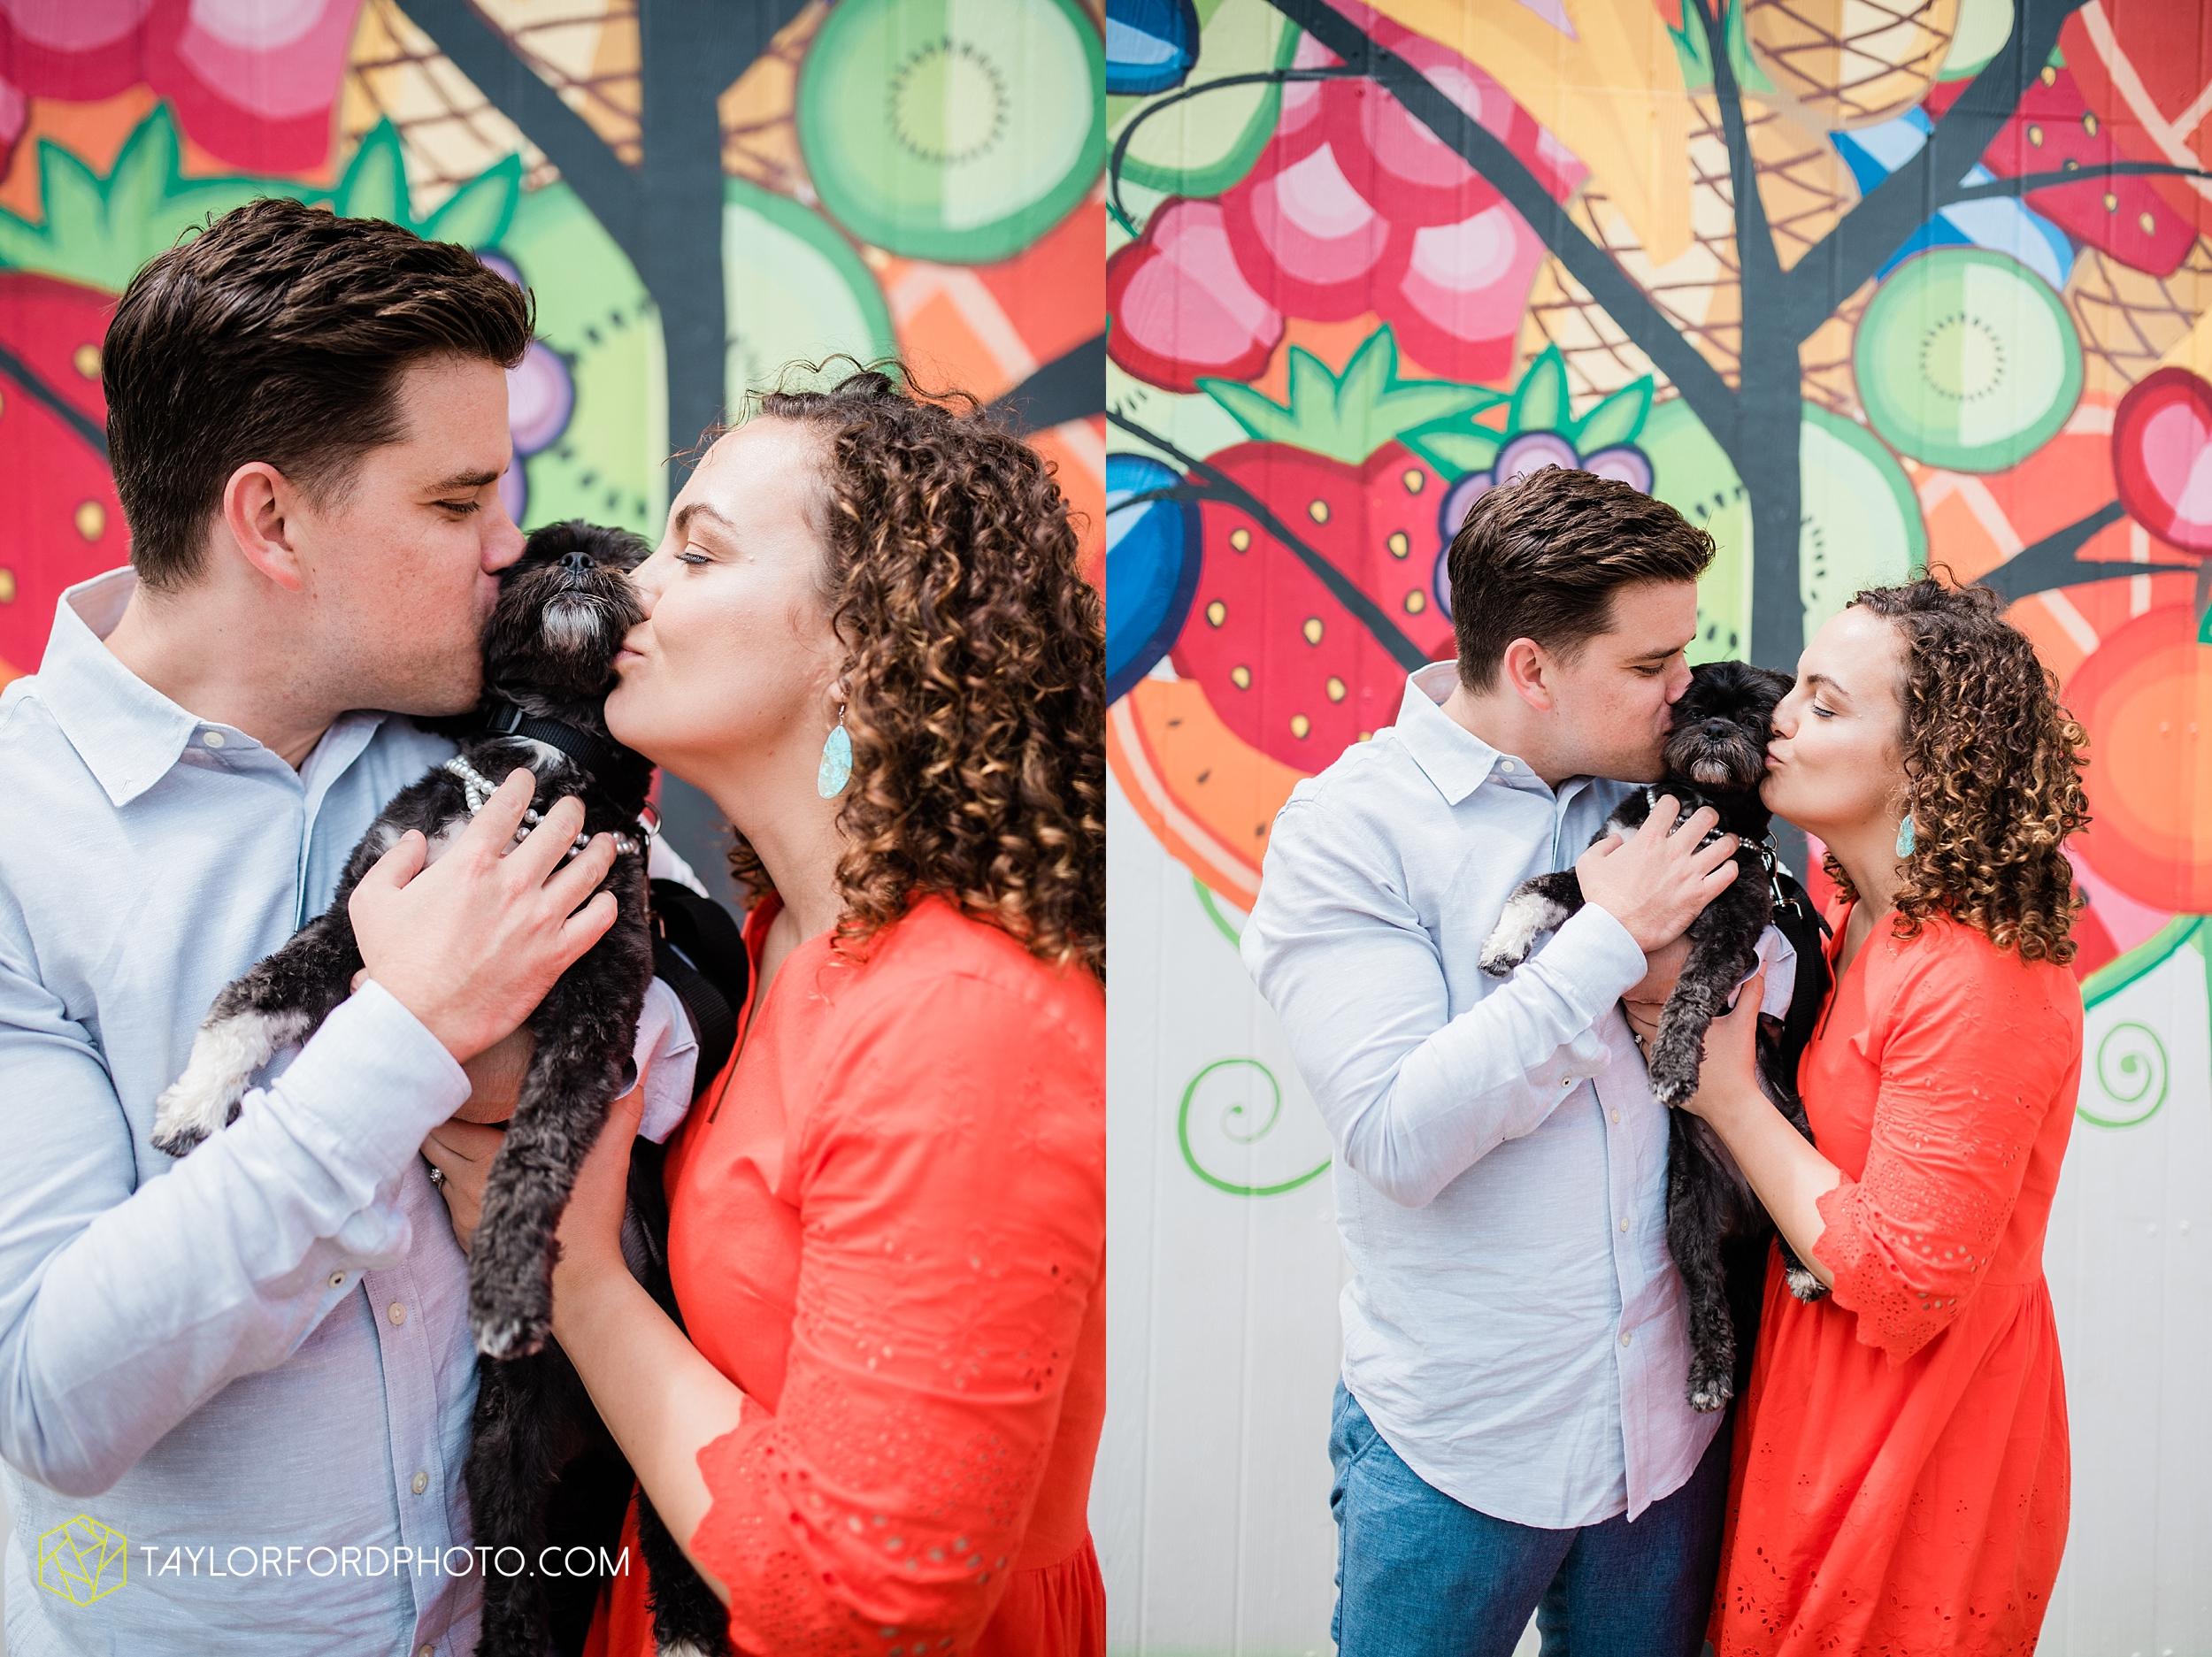 chicago-illinois-ipsento-606-high-line-wicker-park-bucktown-prosecutor-engagement-wedding-photographer-Taylor-Ford-Photography_8719.jpg